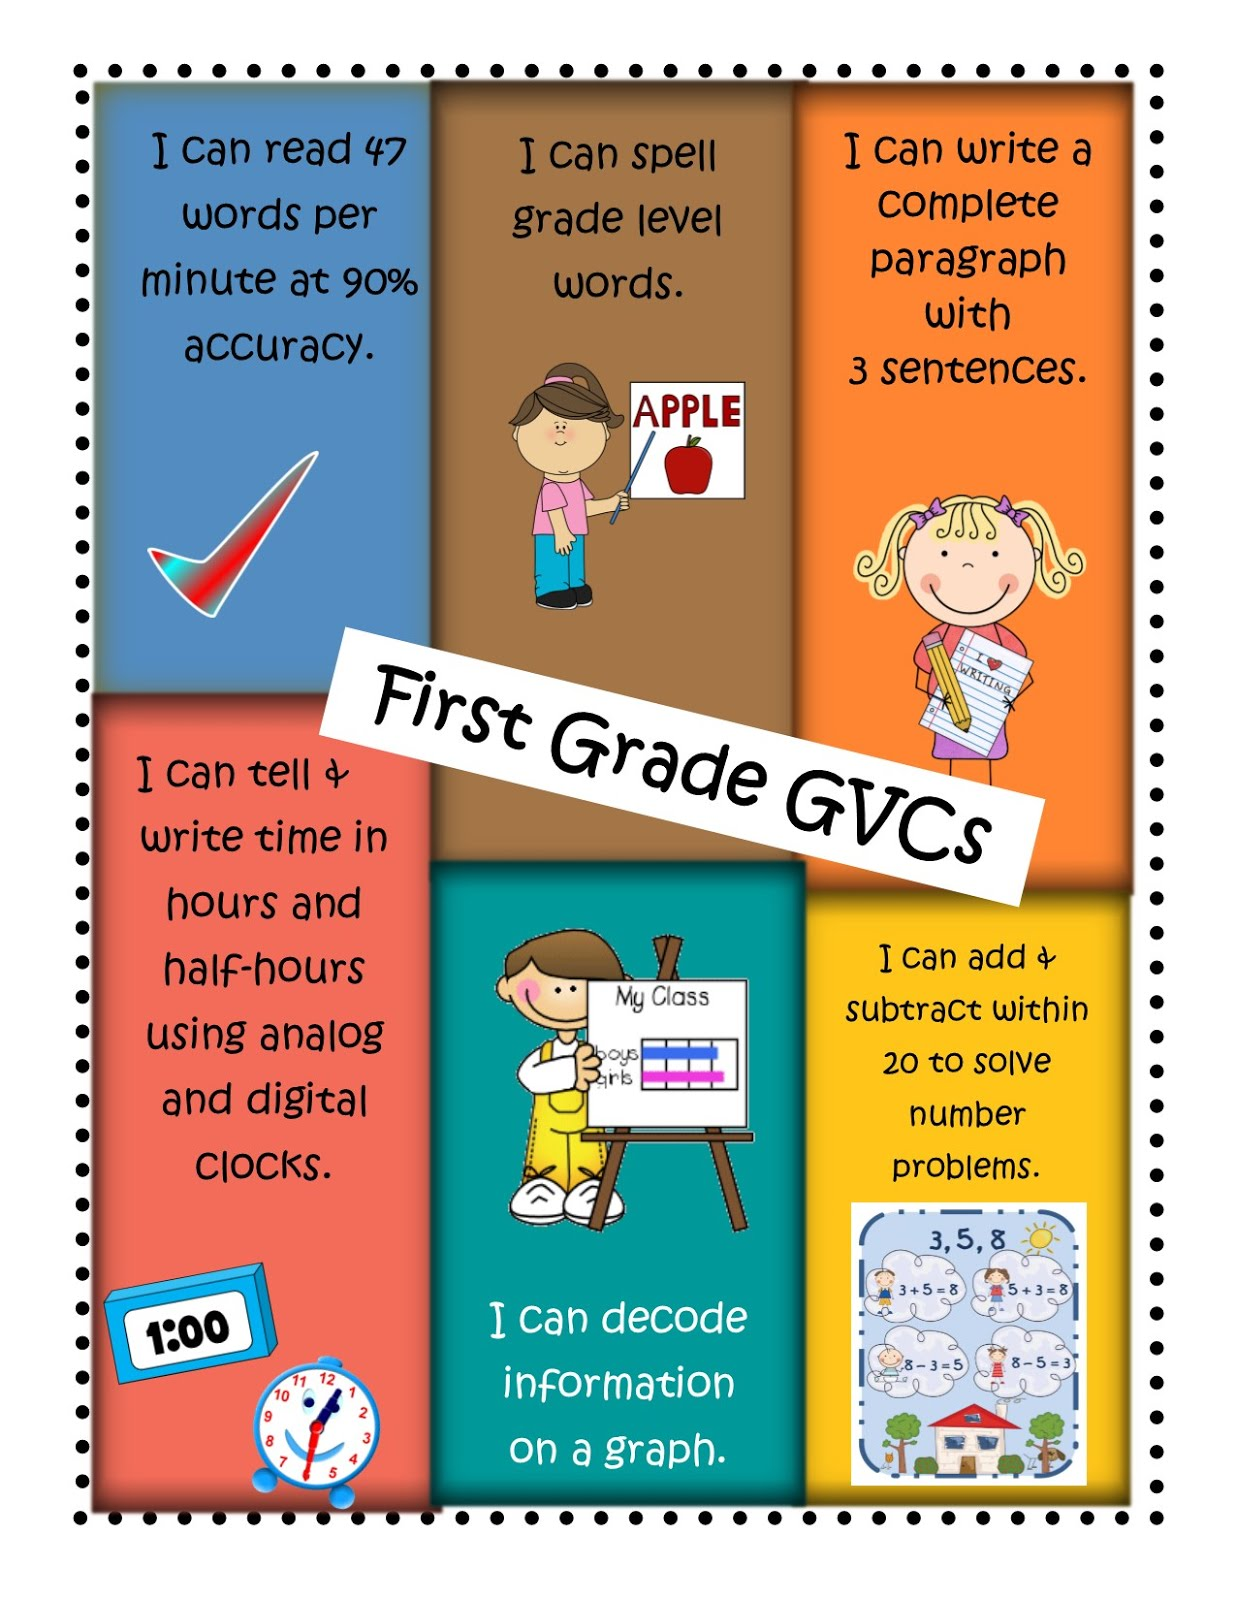 1st Grade GVCs